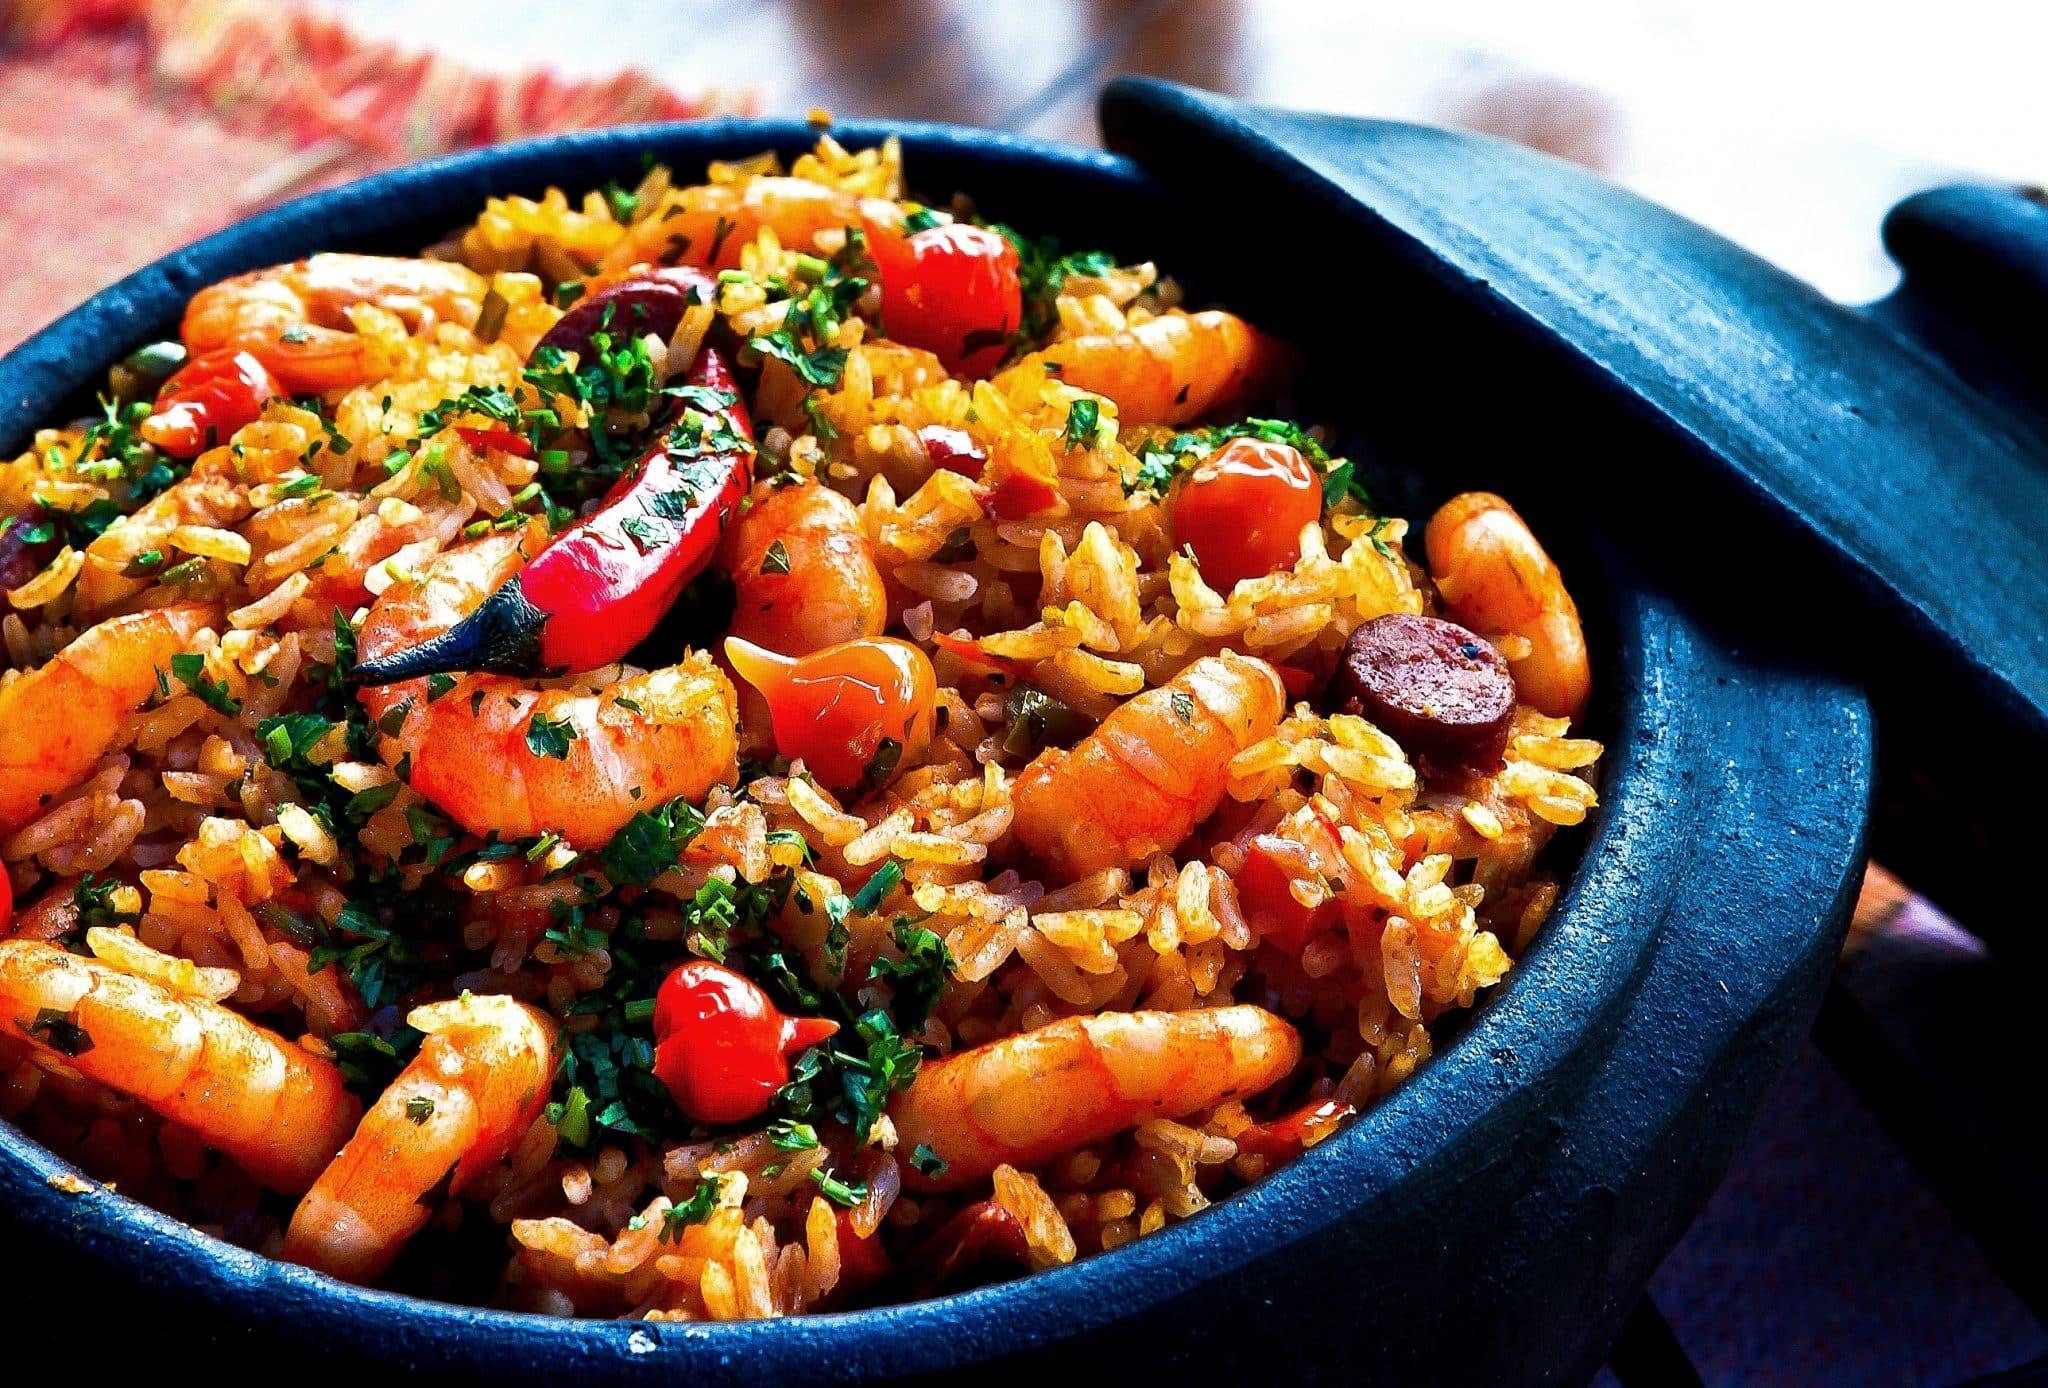 plats-cuisine-repas